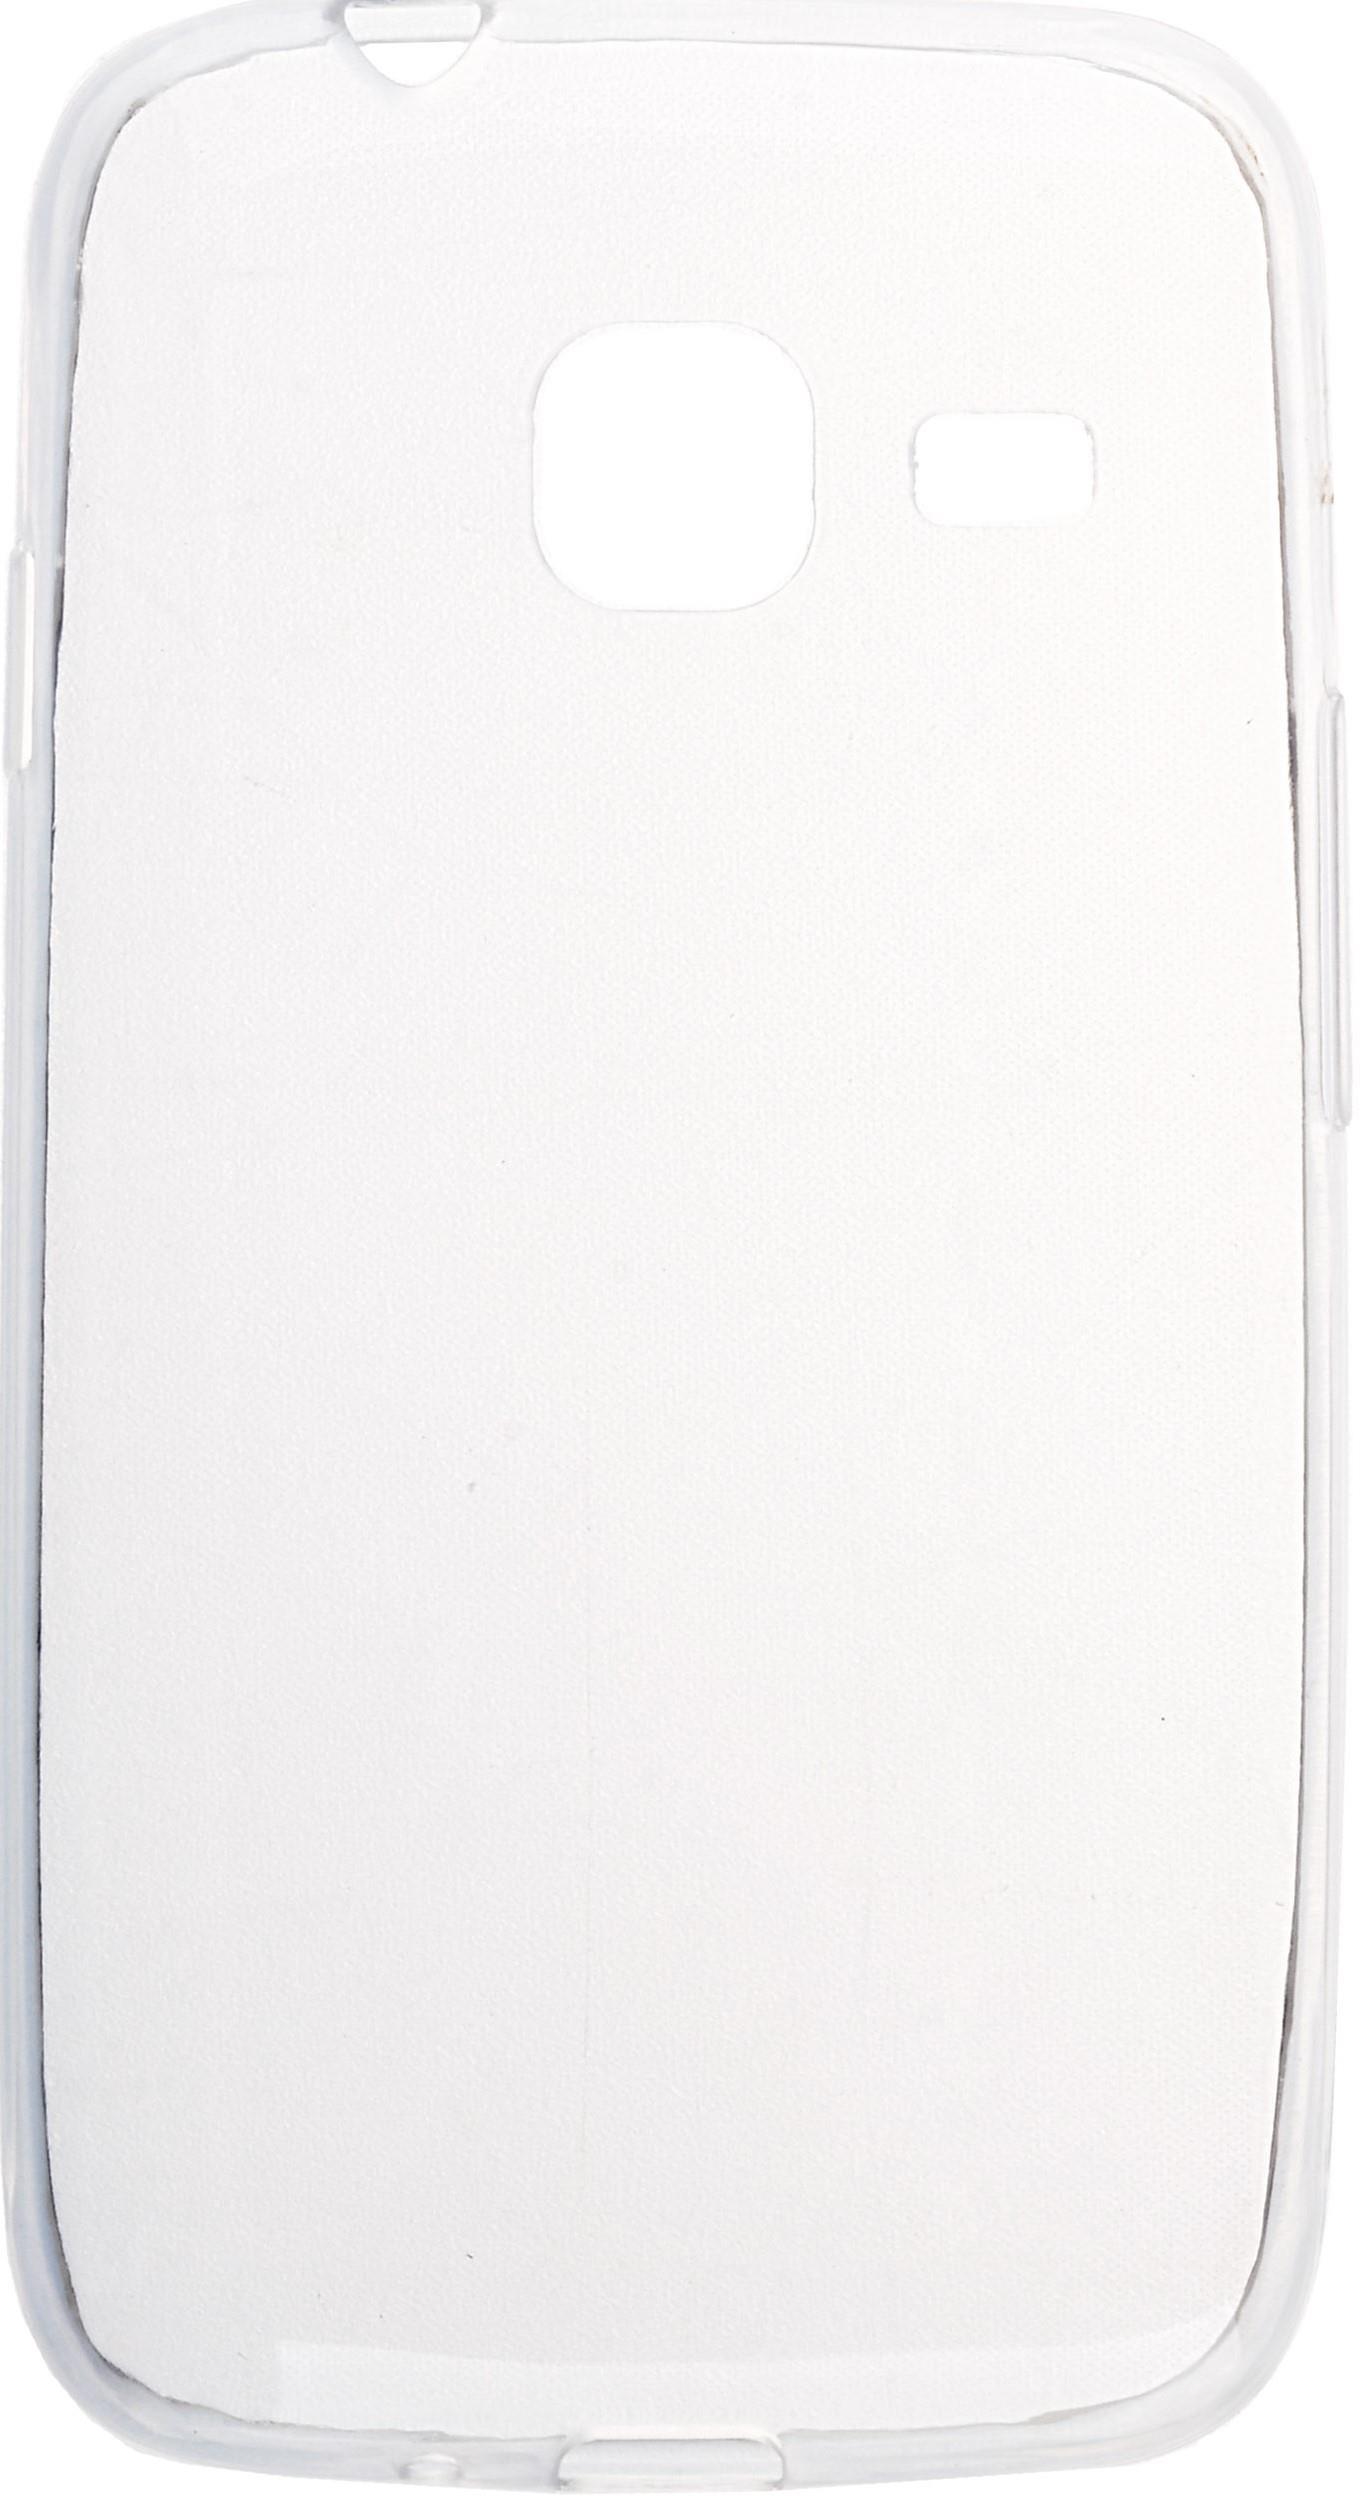 Чехол для сотового телефона skinBOX Slim Silicone, 4630042527904, прозрачный цена и фото